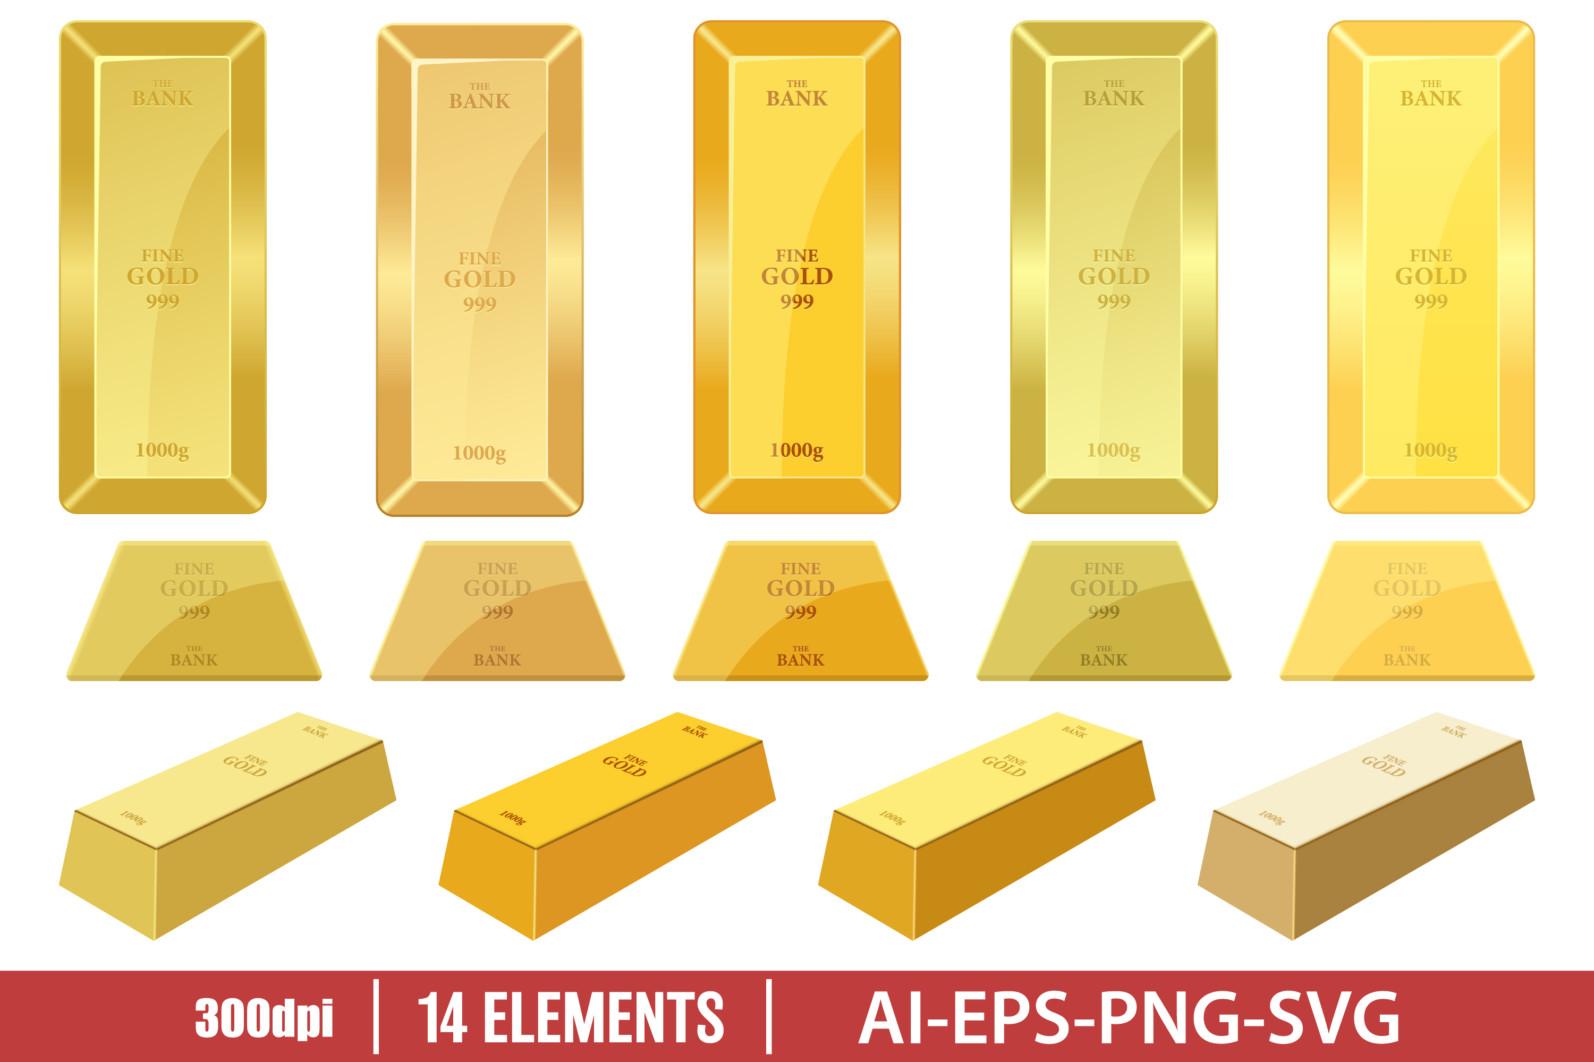 Gold bar clipart vector design illustration. Gold ingot set. Vector Clipart Print - GOLDEN BAR scaled -